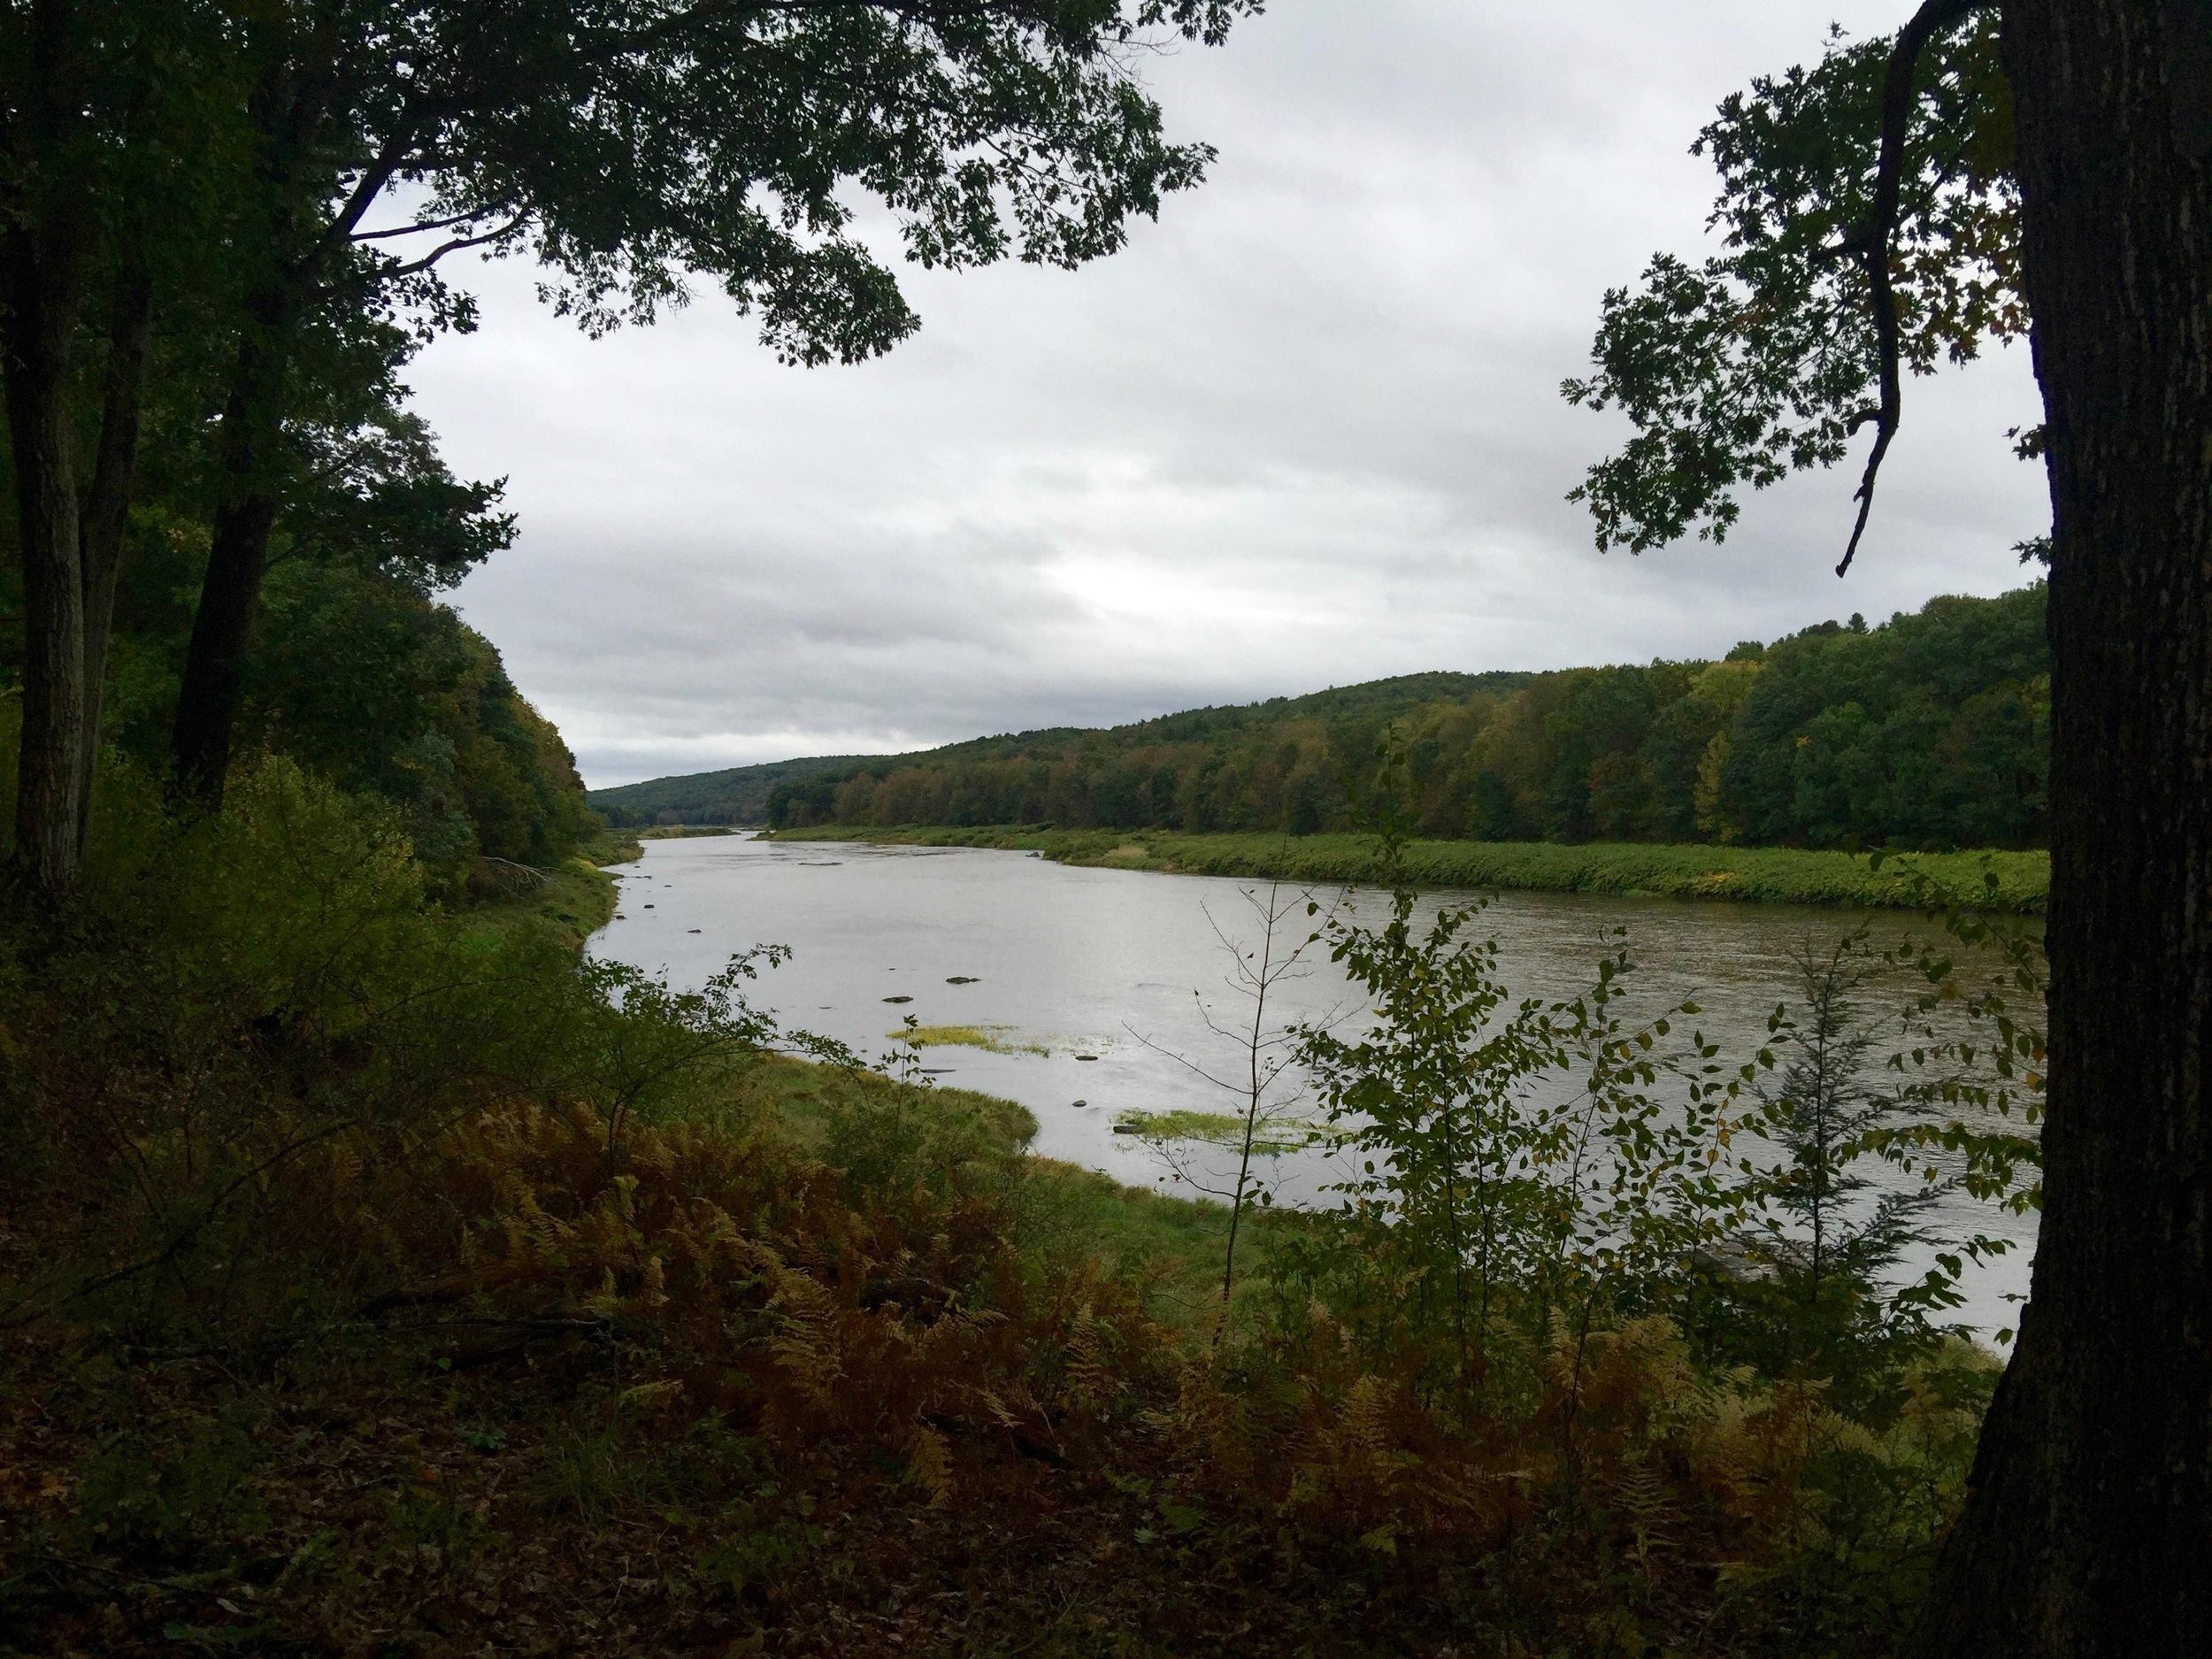 The Delaware River near Equinunk, PA